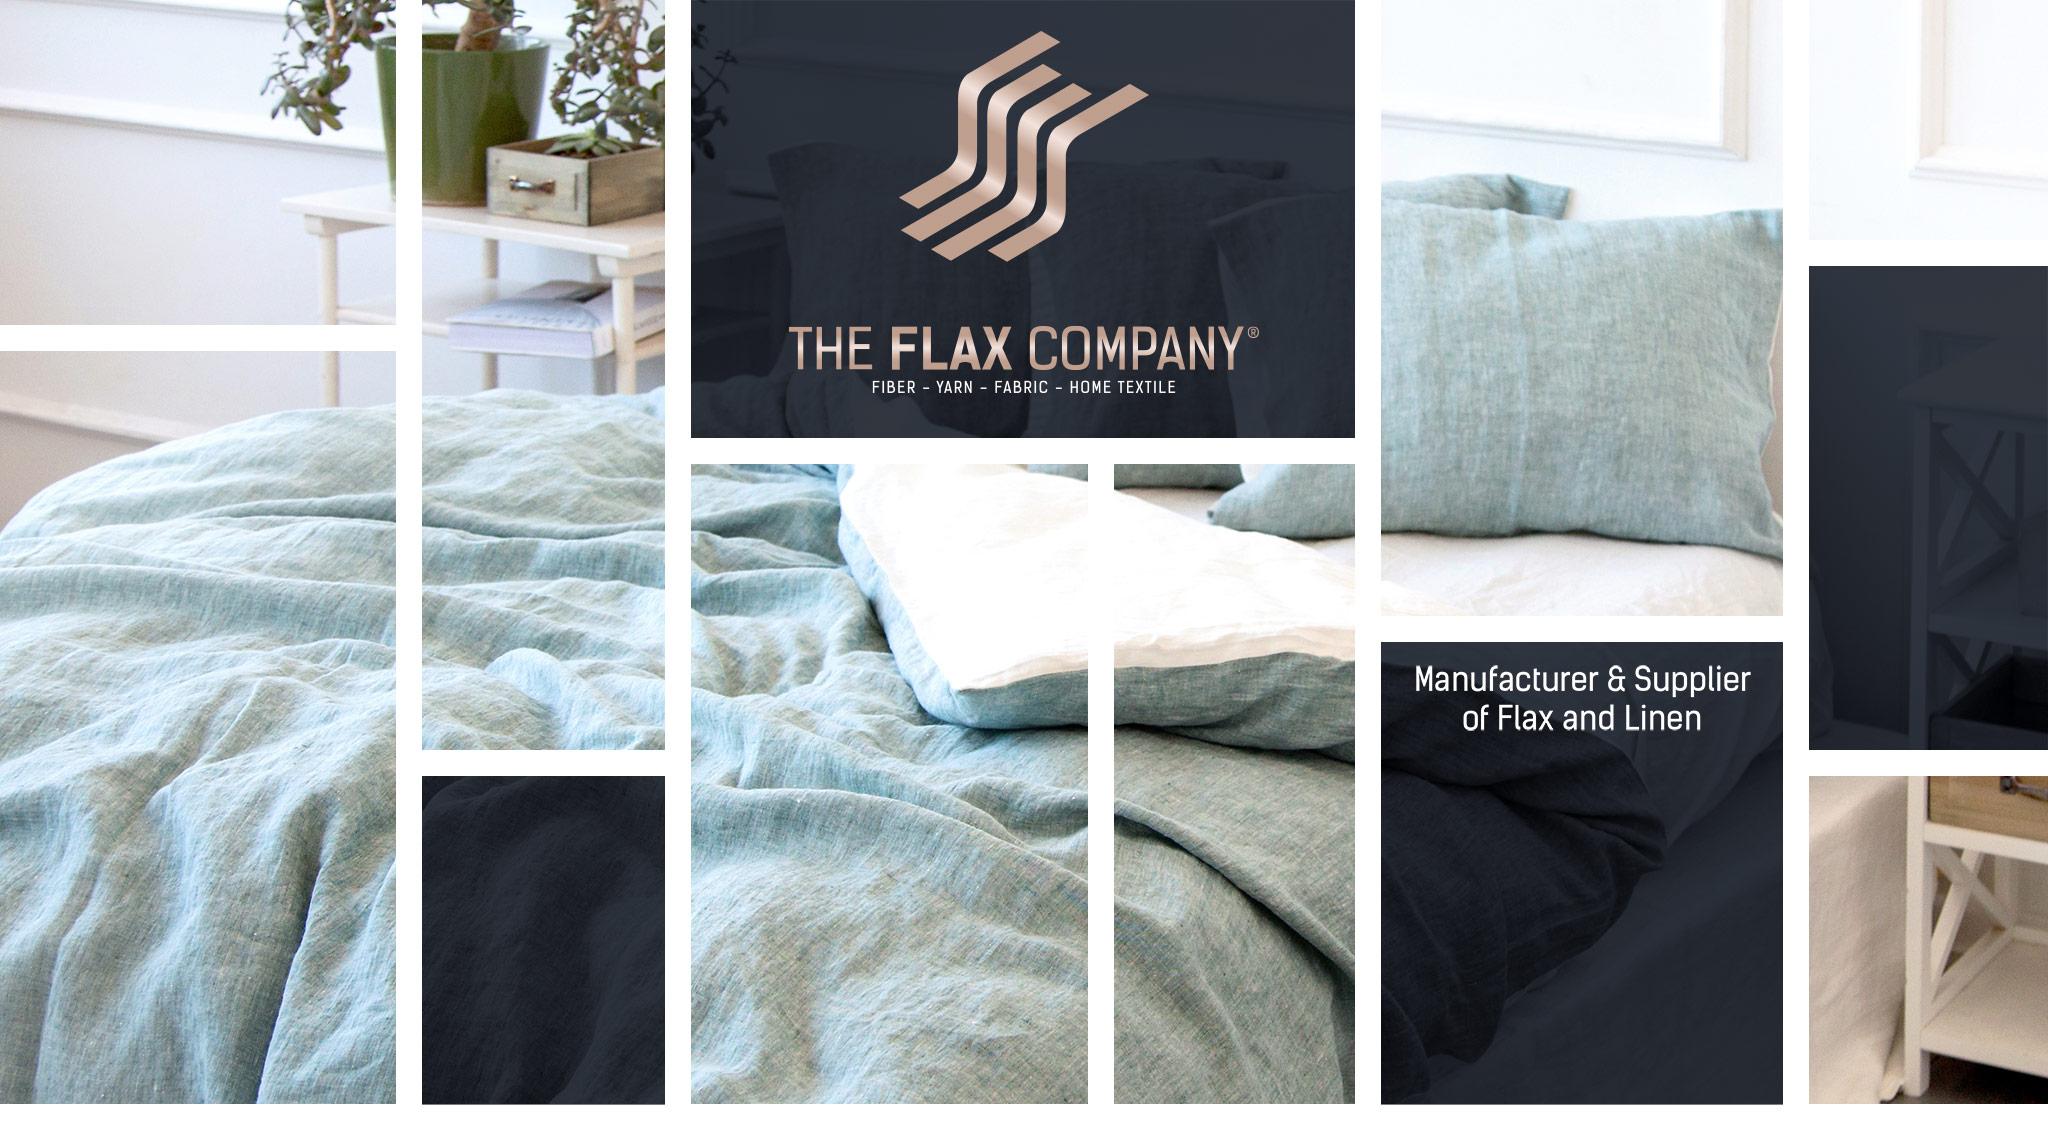 The Flax Company